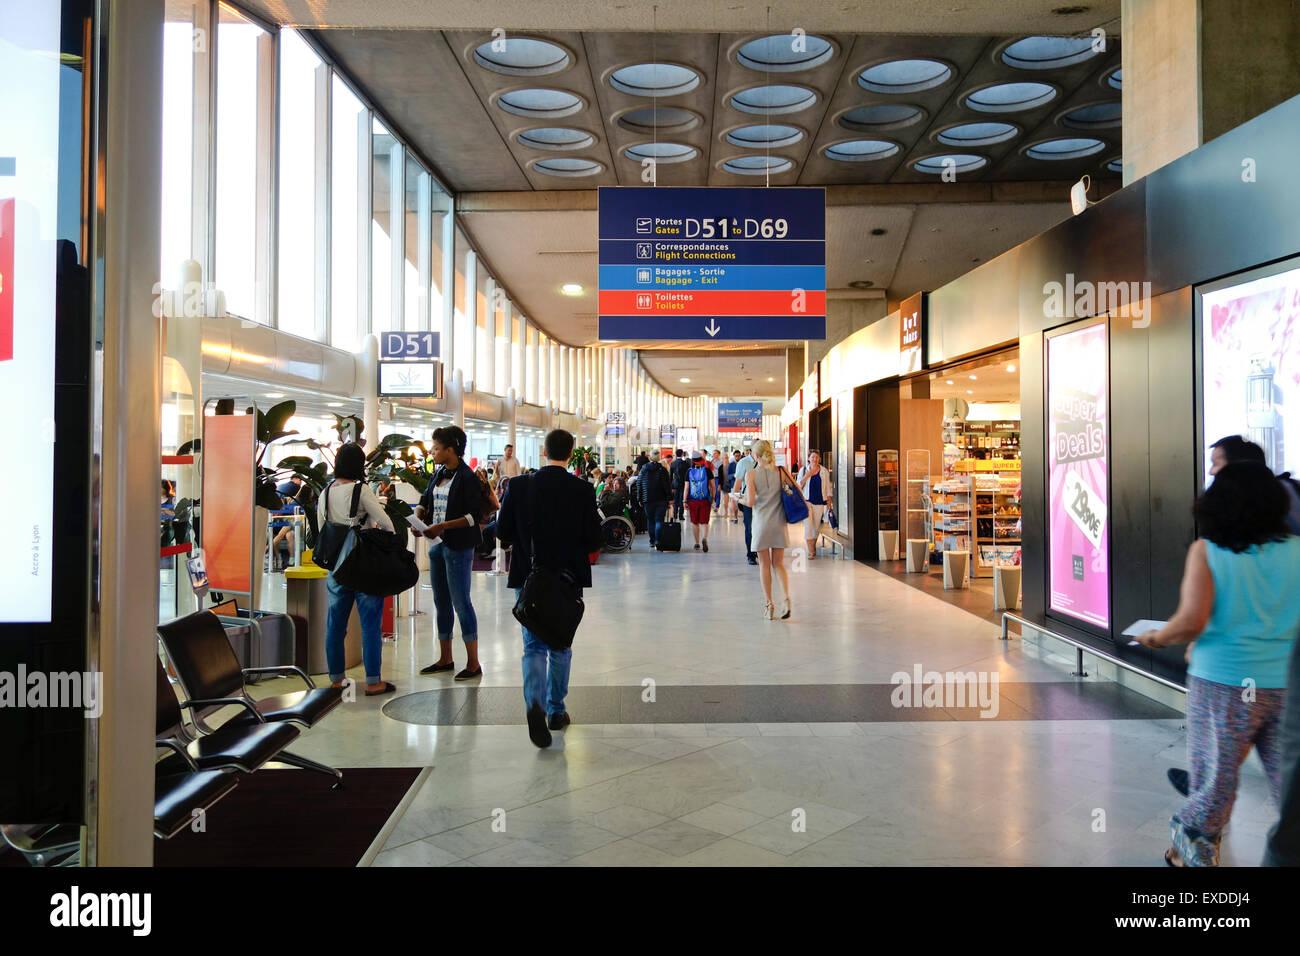 Terminal 2d Gates, passengers shopping duty free shops at Charles de Gaulle, airport, Paris, France. - Stock Image